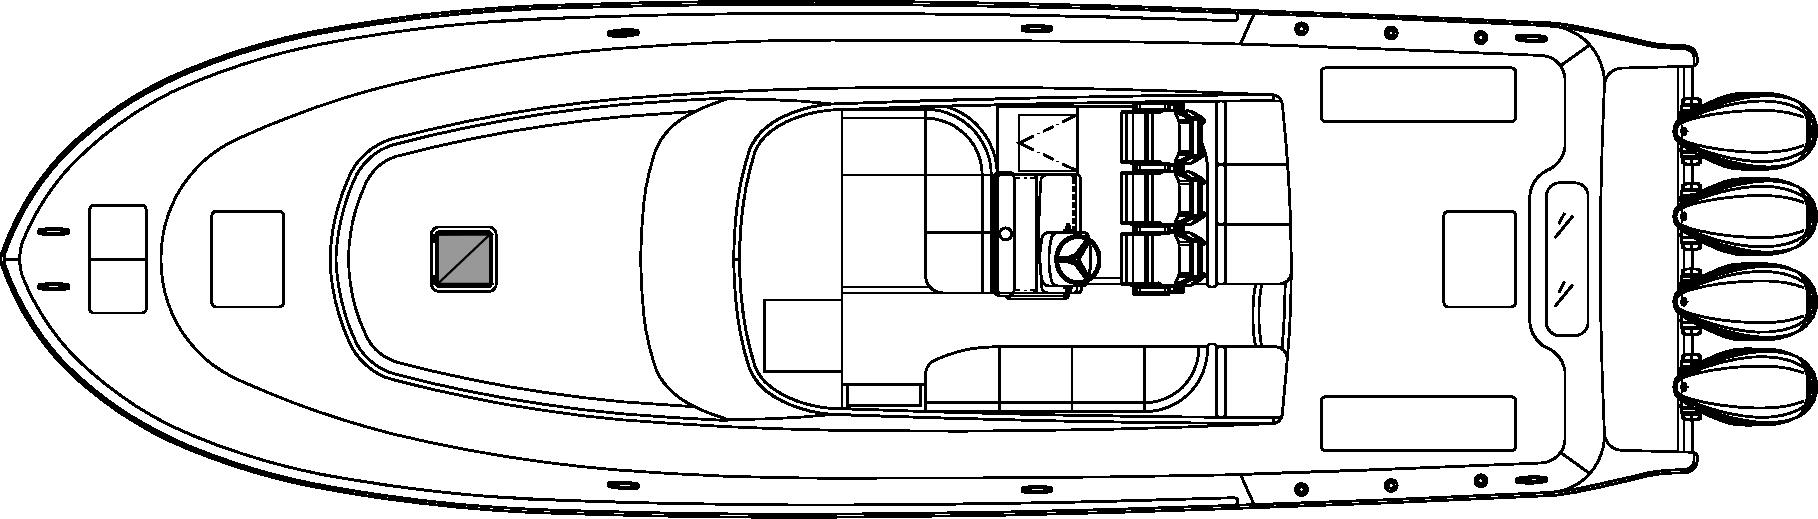 47fr horizontal